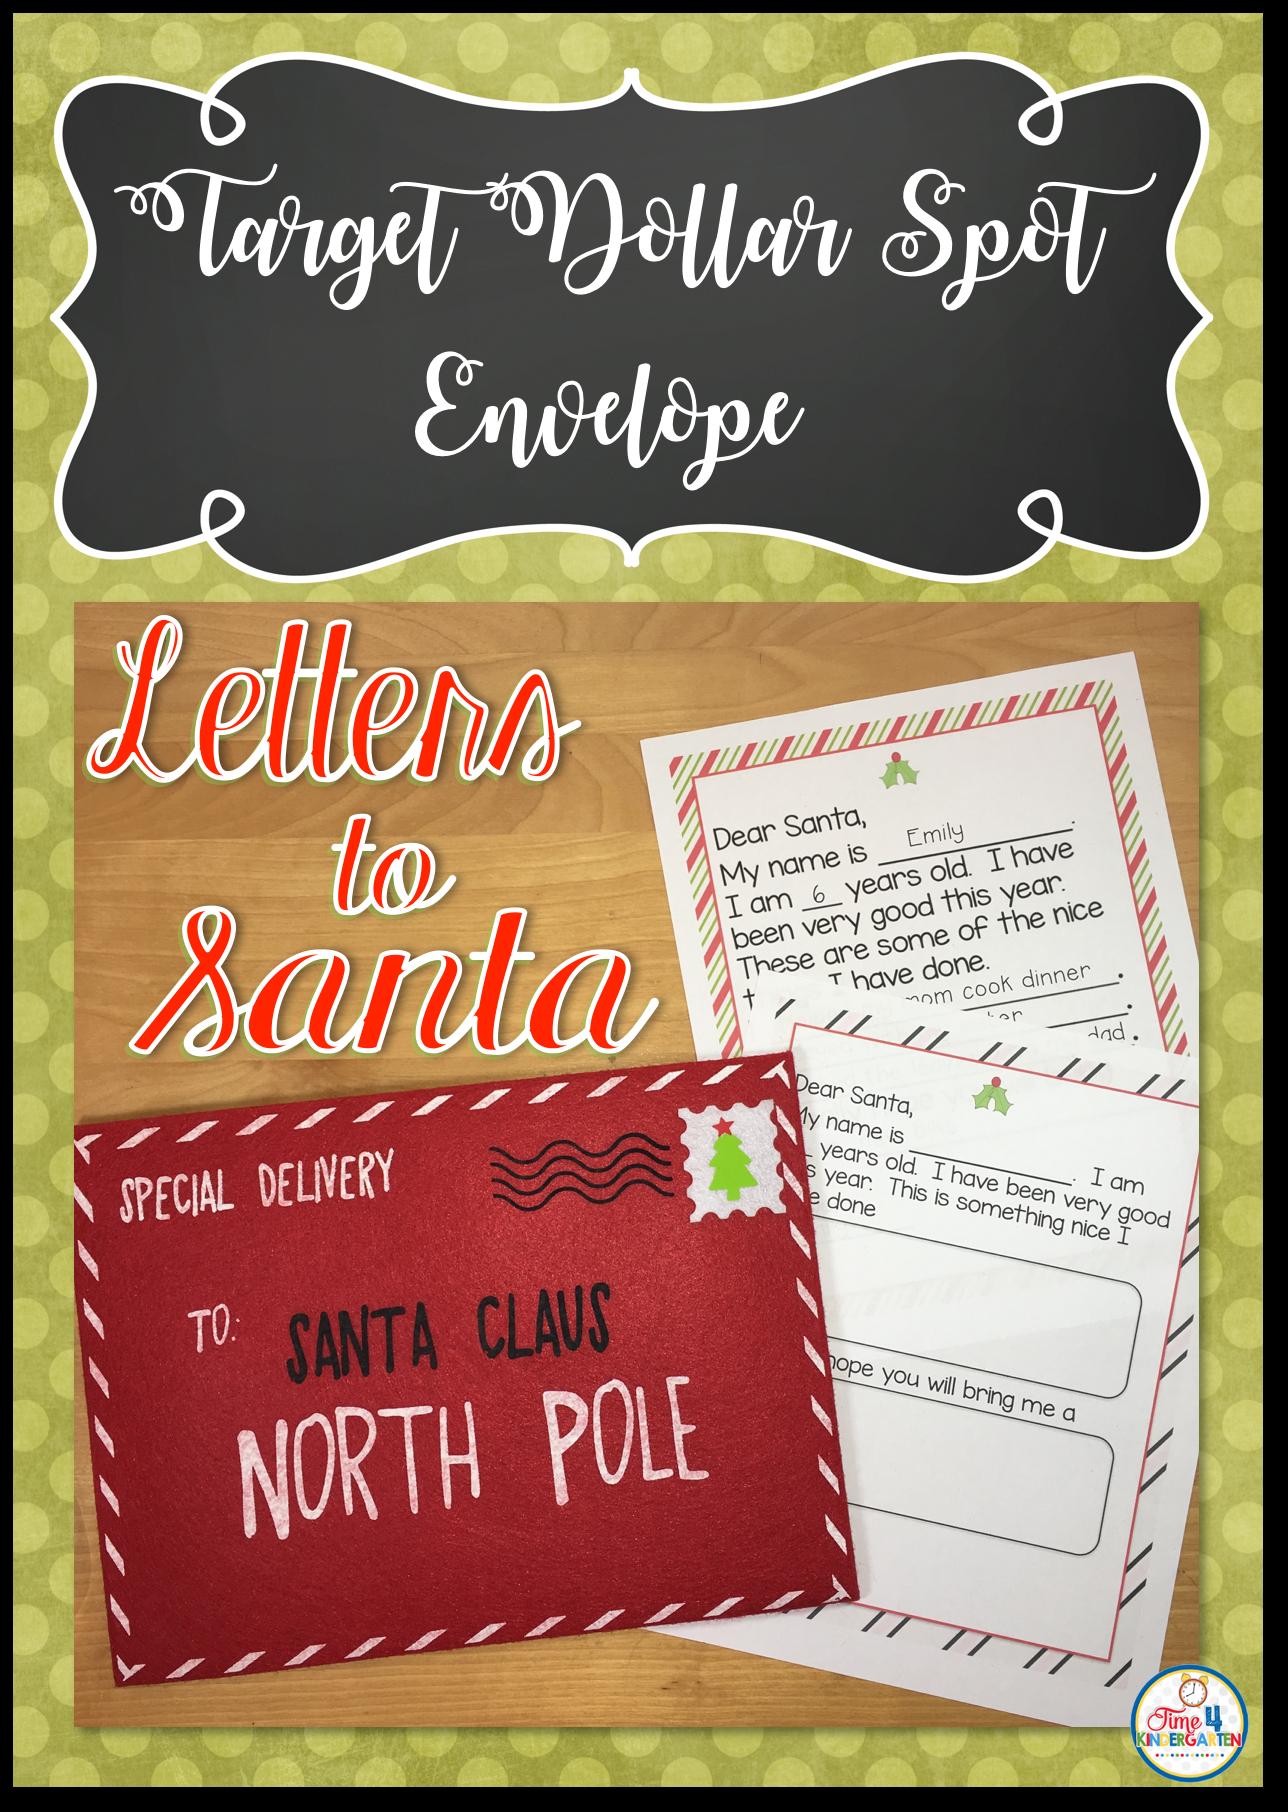 Letters to Santa Claus Santa letter, Lettering, Envelope